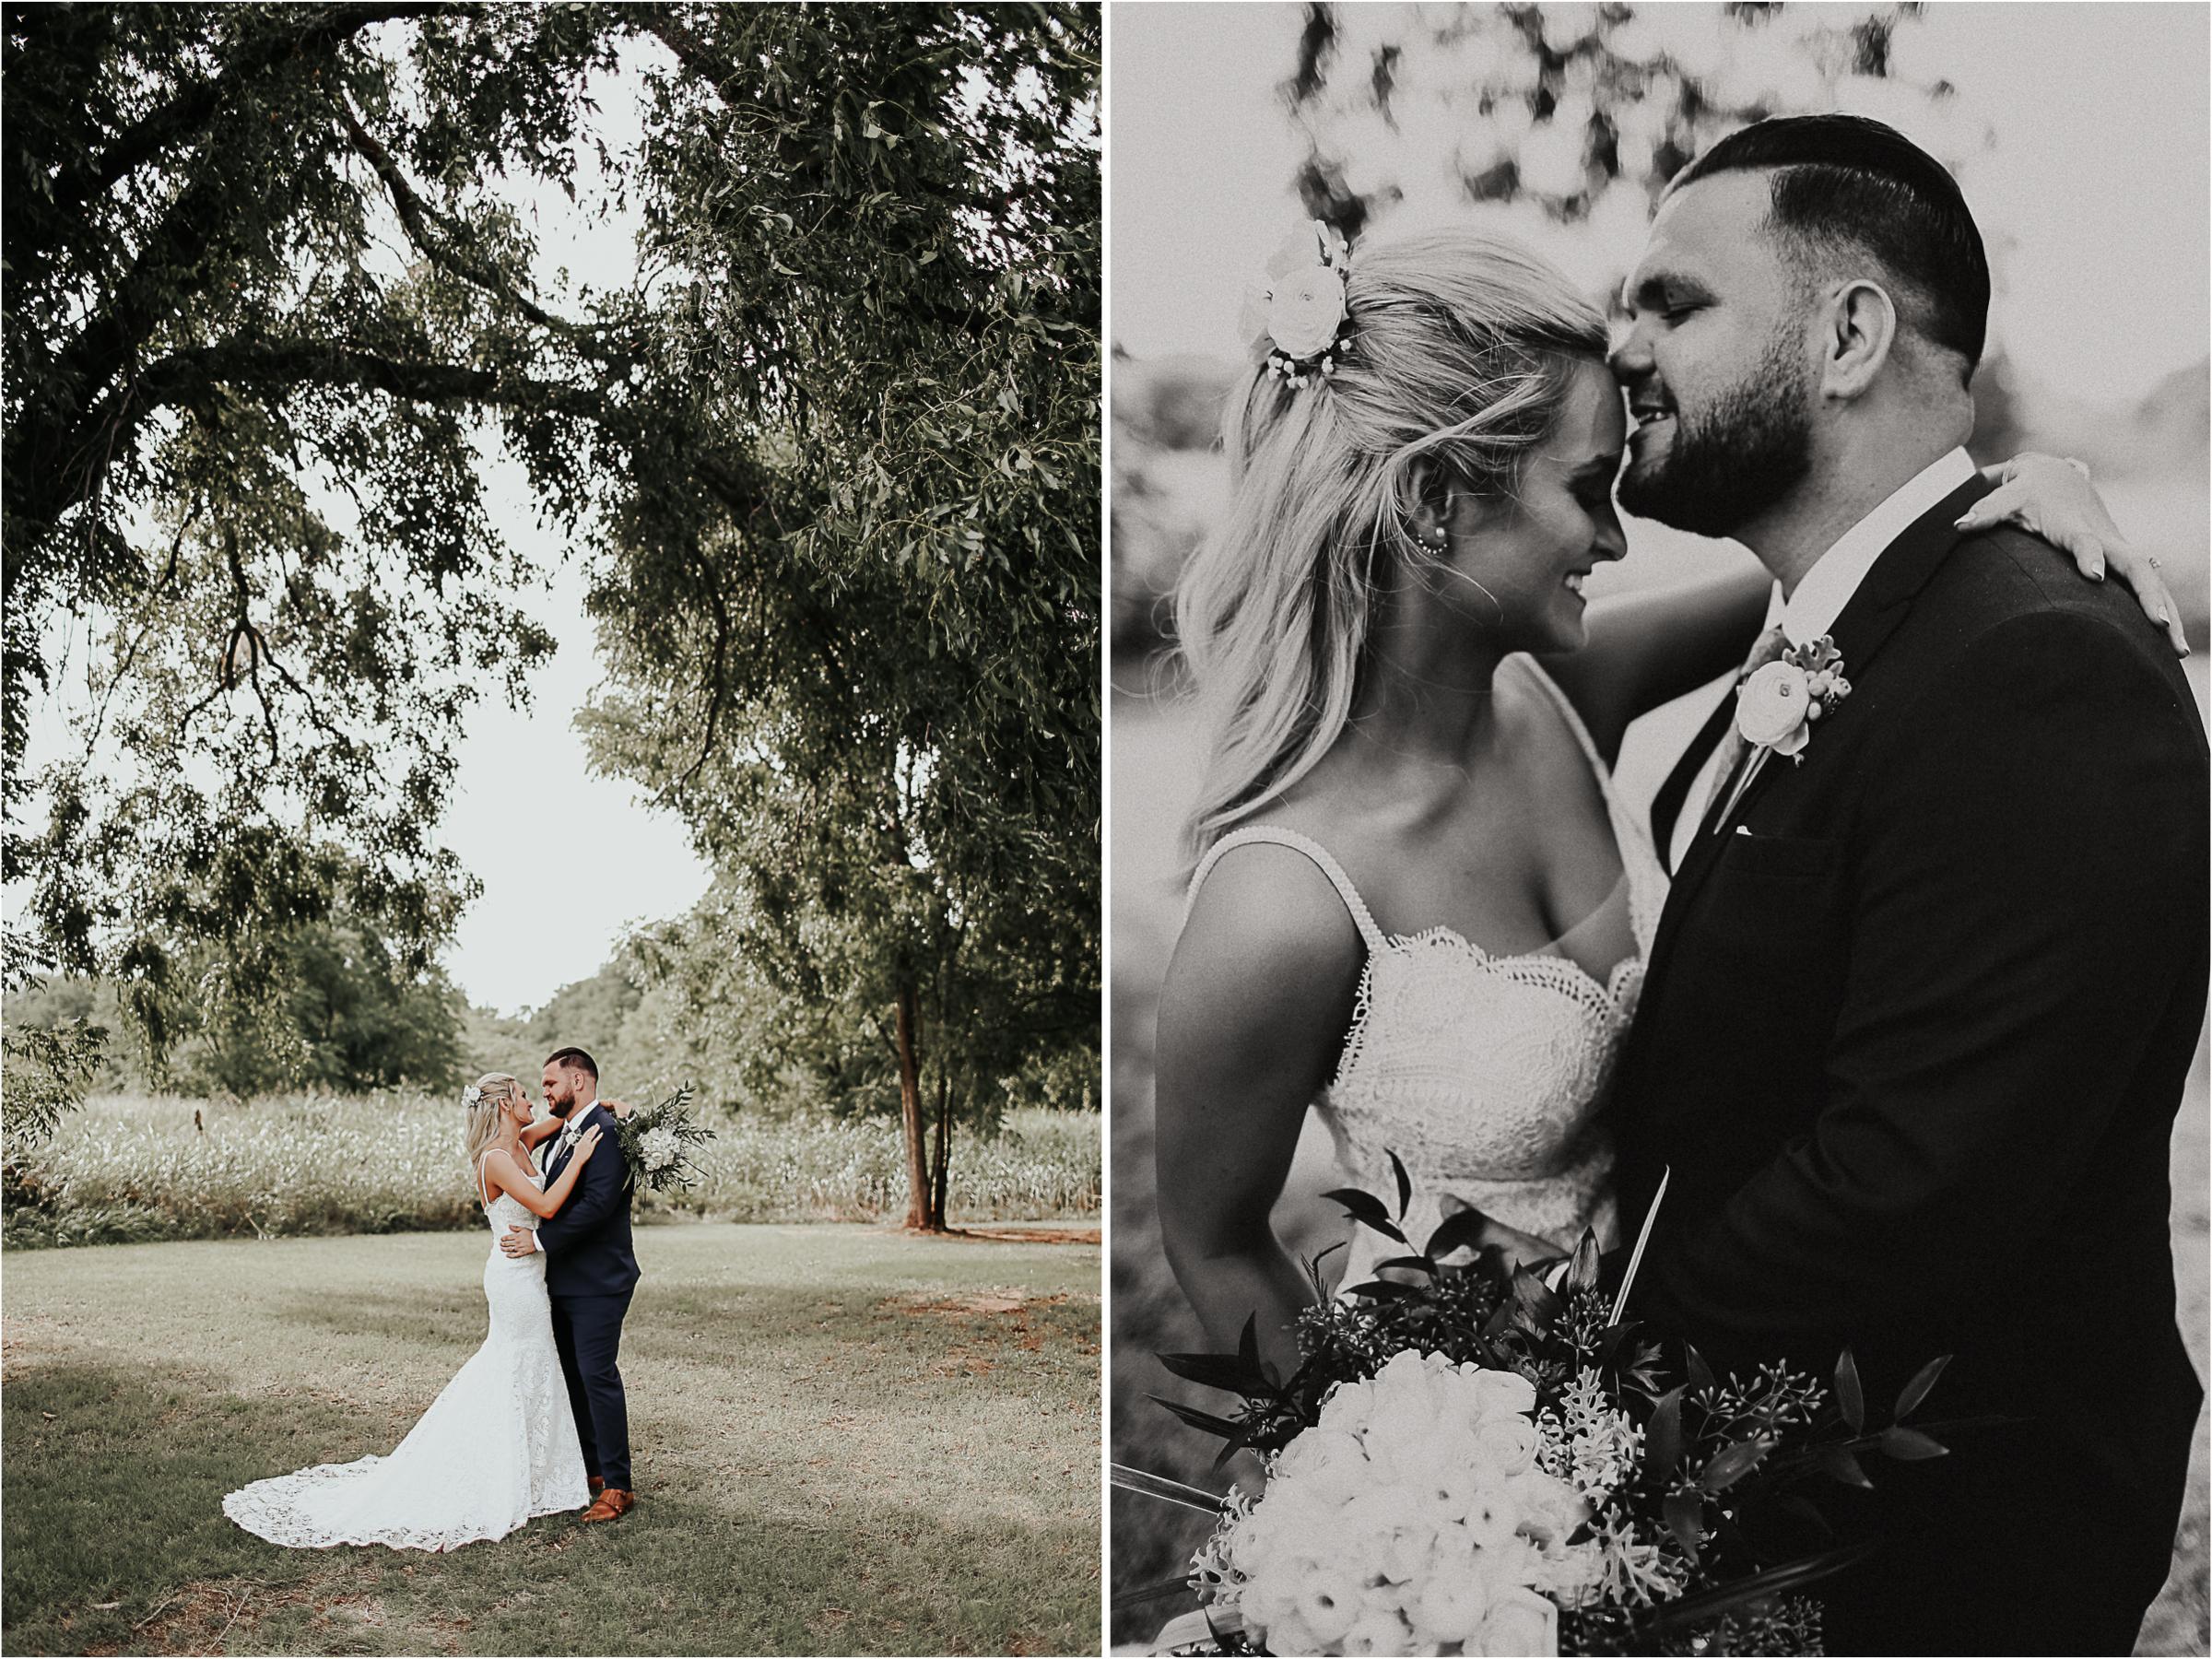 Backyard_Wedding_Oklahoma_MelissaMarshall_12.jpg